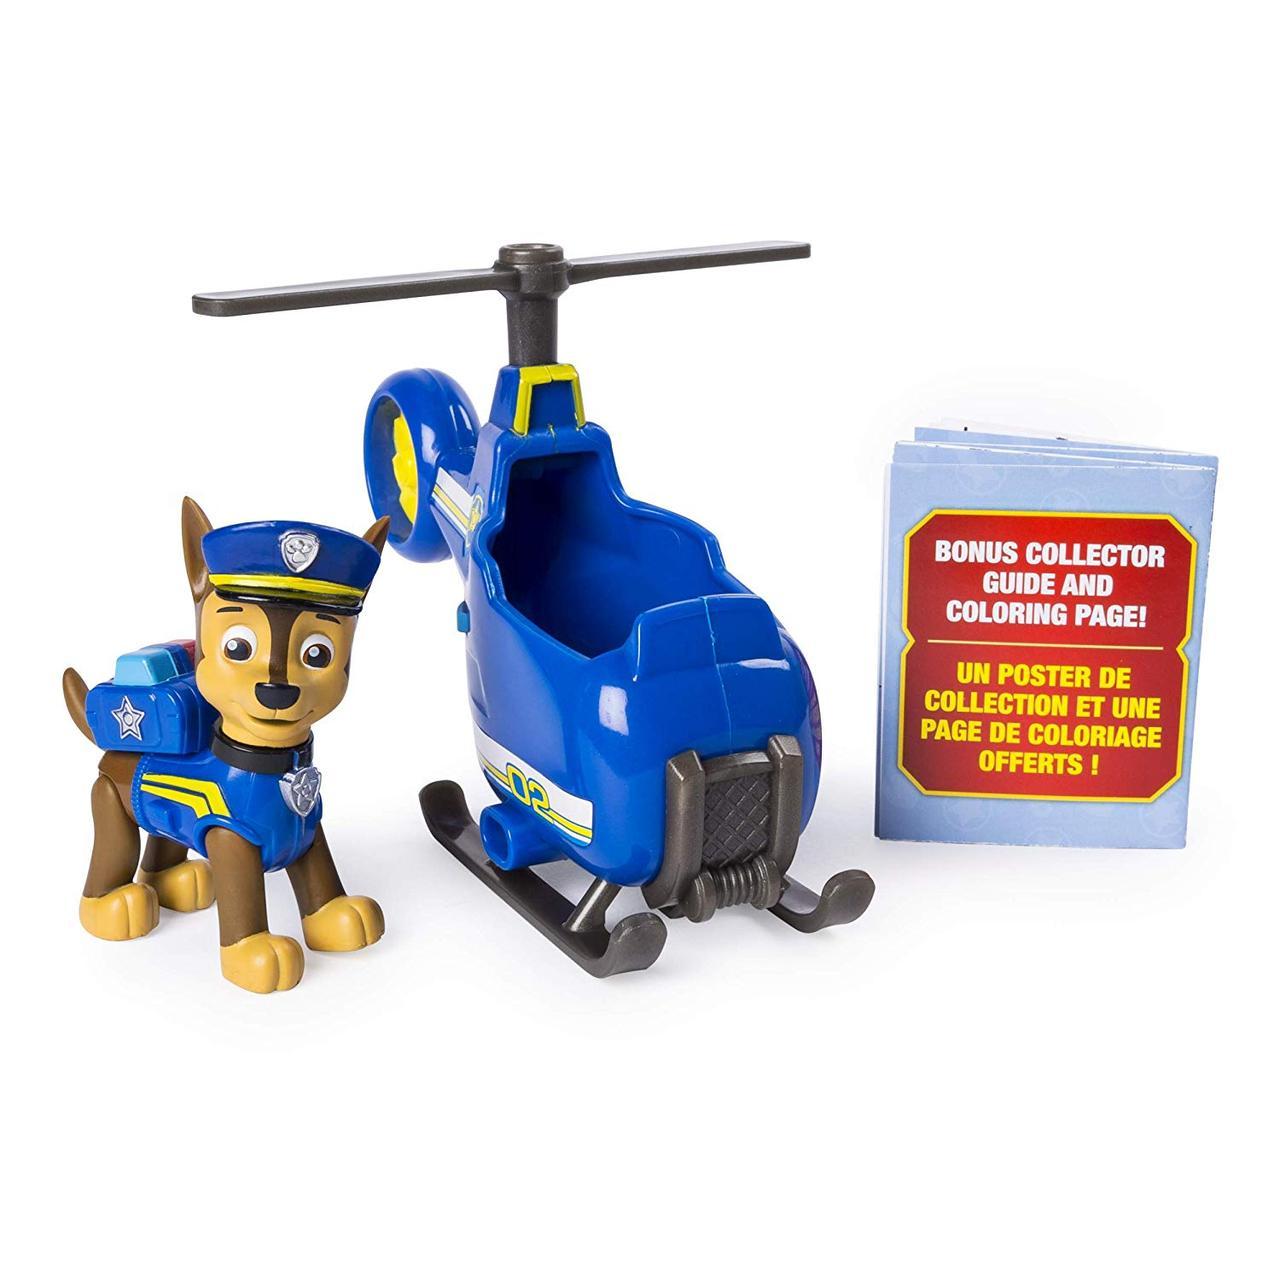 Щенячий патруль Чейз гонщик и мини вертолетОригинал PAW Patrol Ultimate Rescue Chase's Mini Helicopter